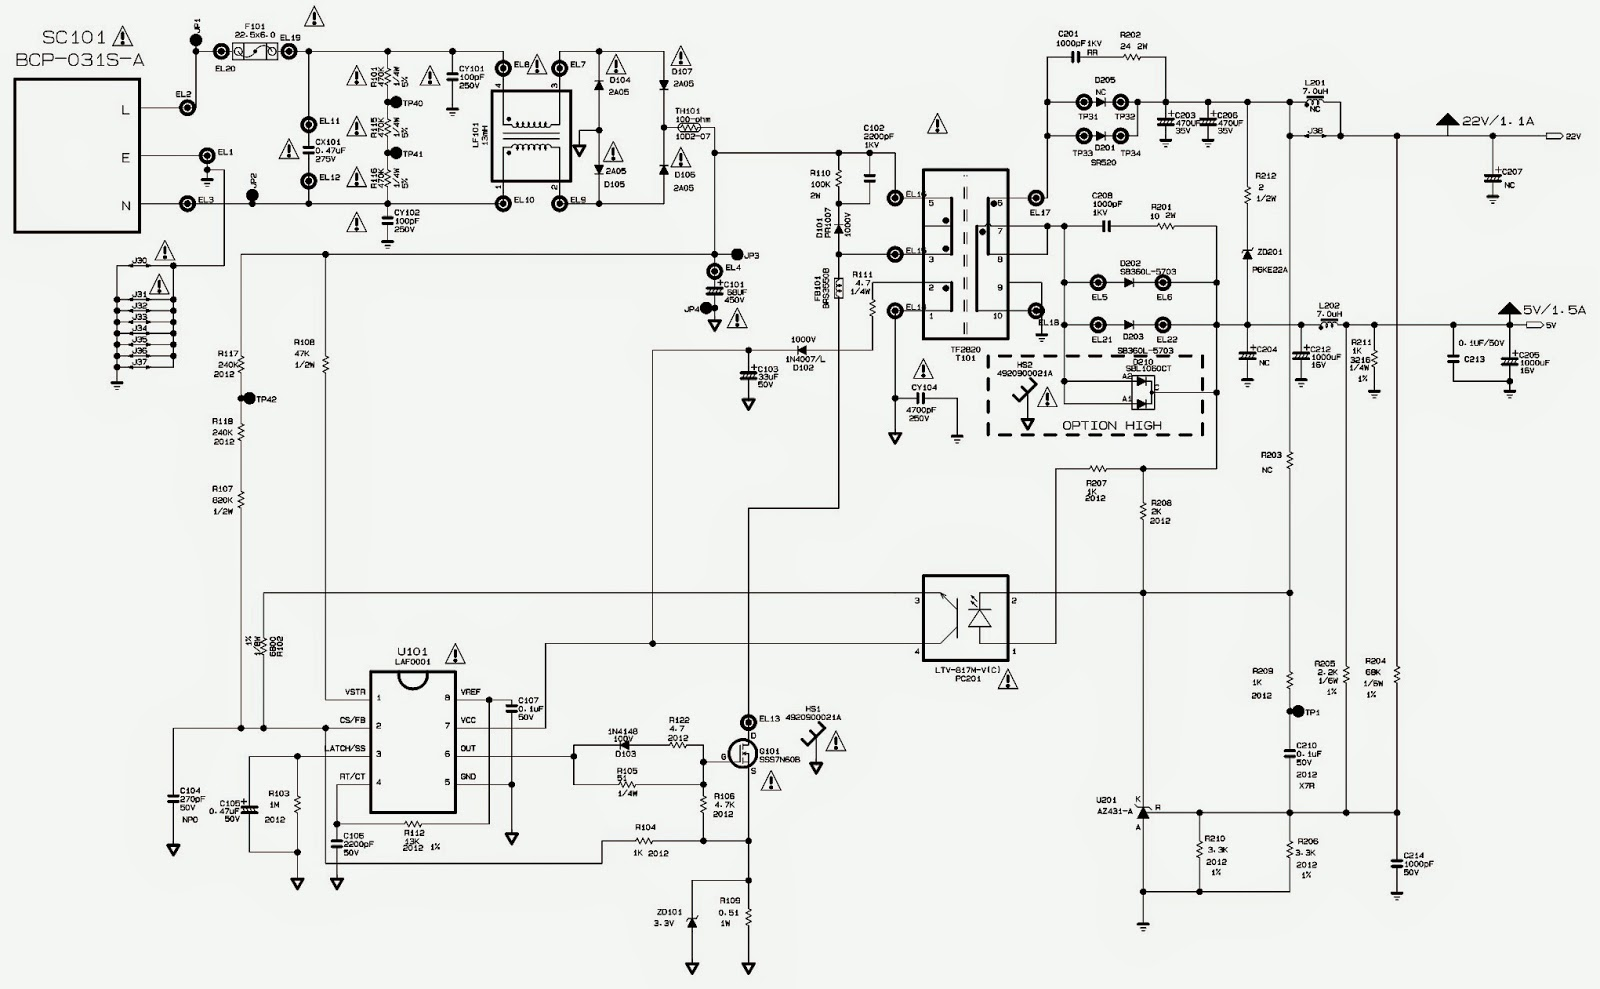 LG FLATRON W1942S LCD MONITOR – AOCL32W831 – PHILCO28T35DG